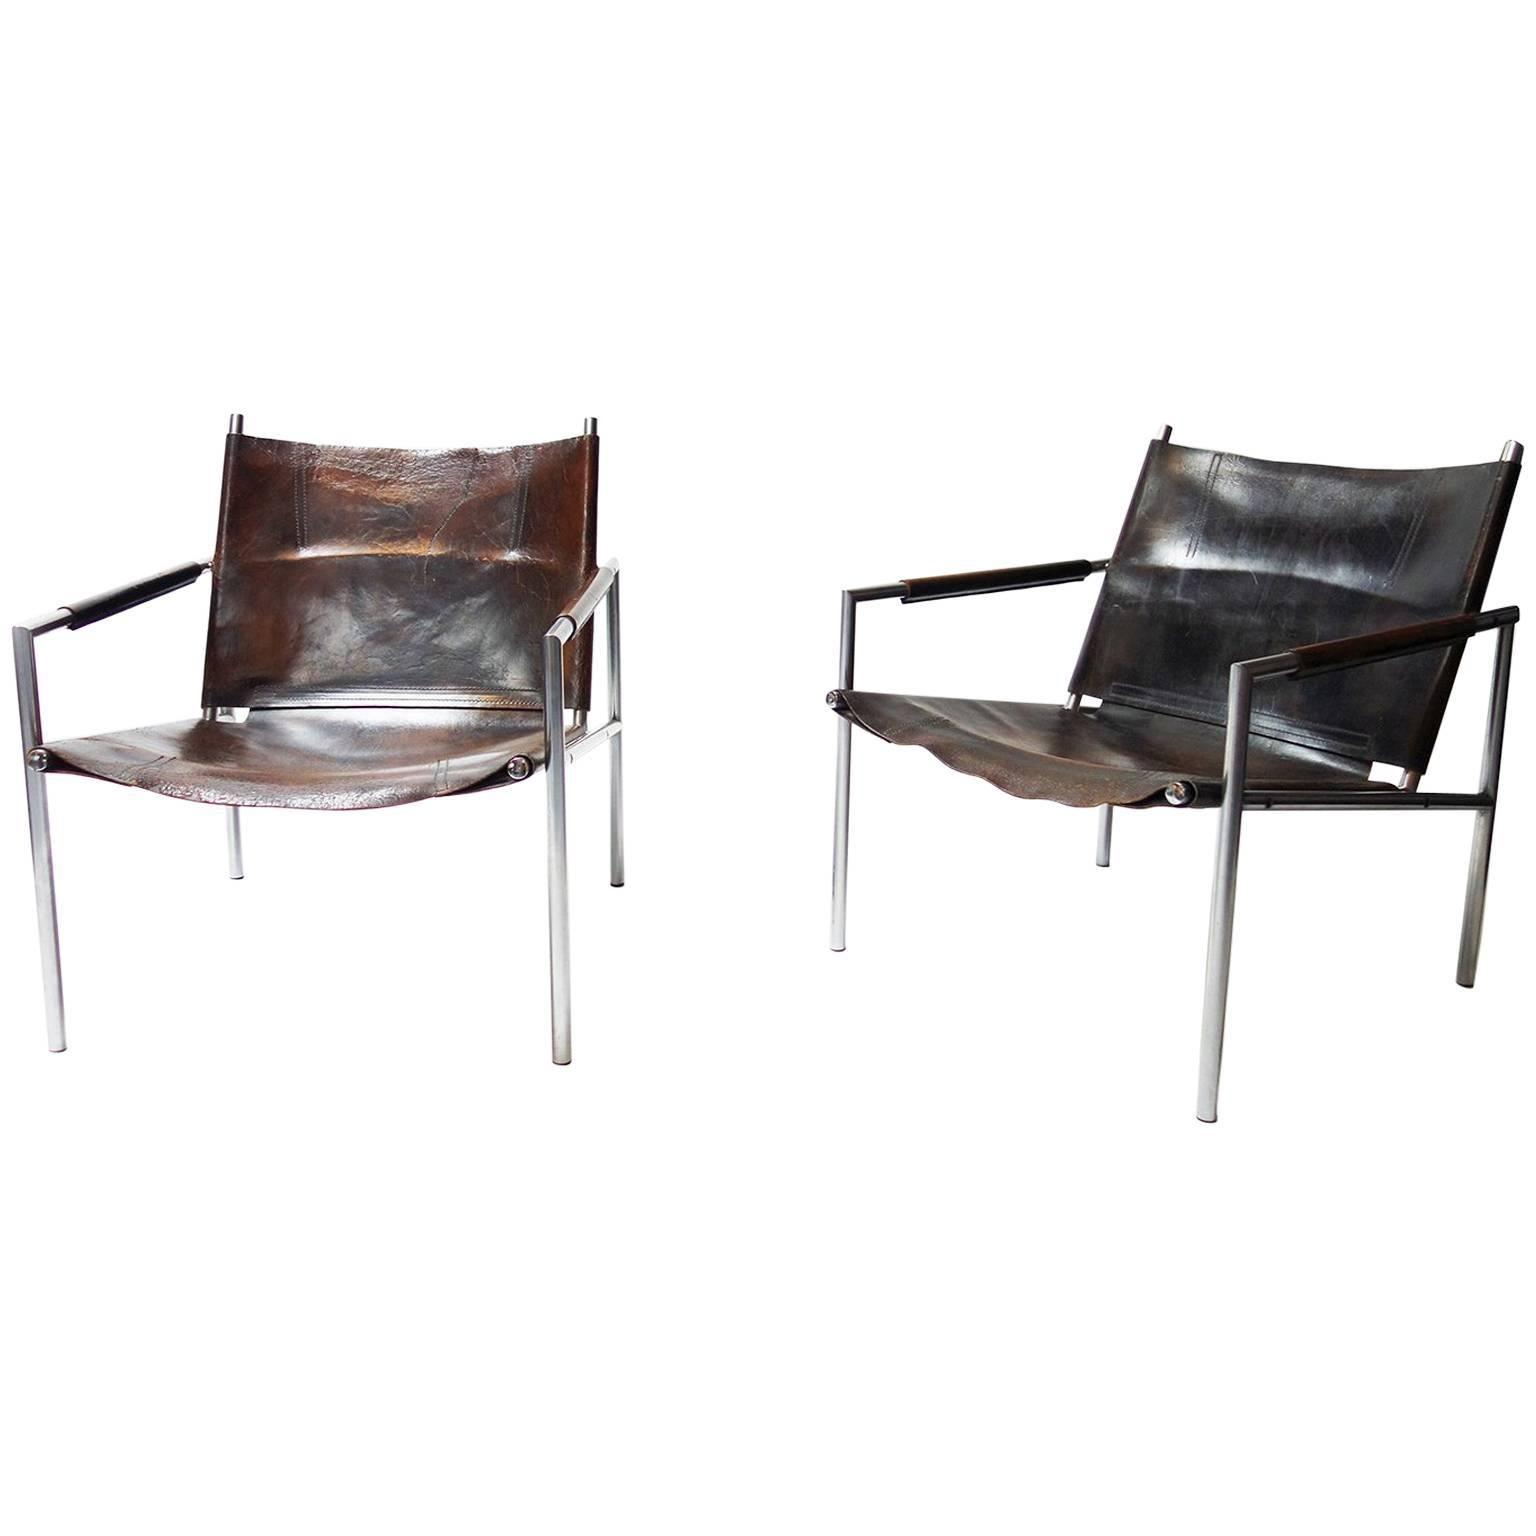 Pair Of Lounge Chair Model U0027SZ02u0027 By Martin Visser For U0027t Spectrum Bergeijk